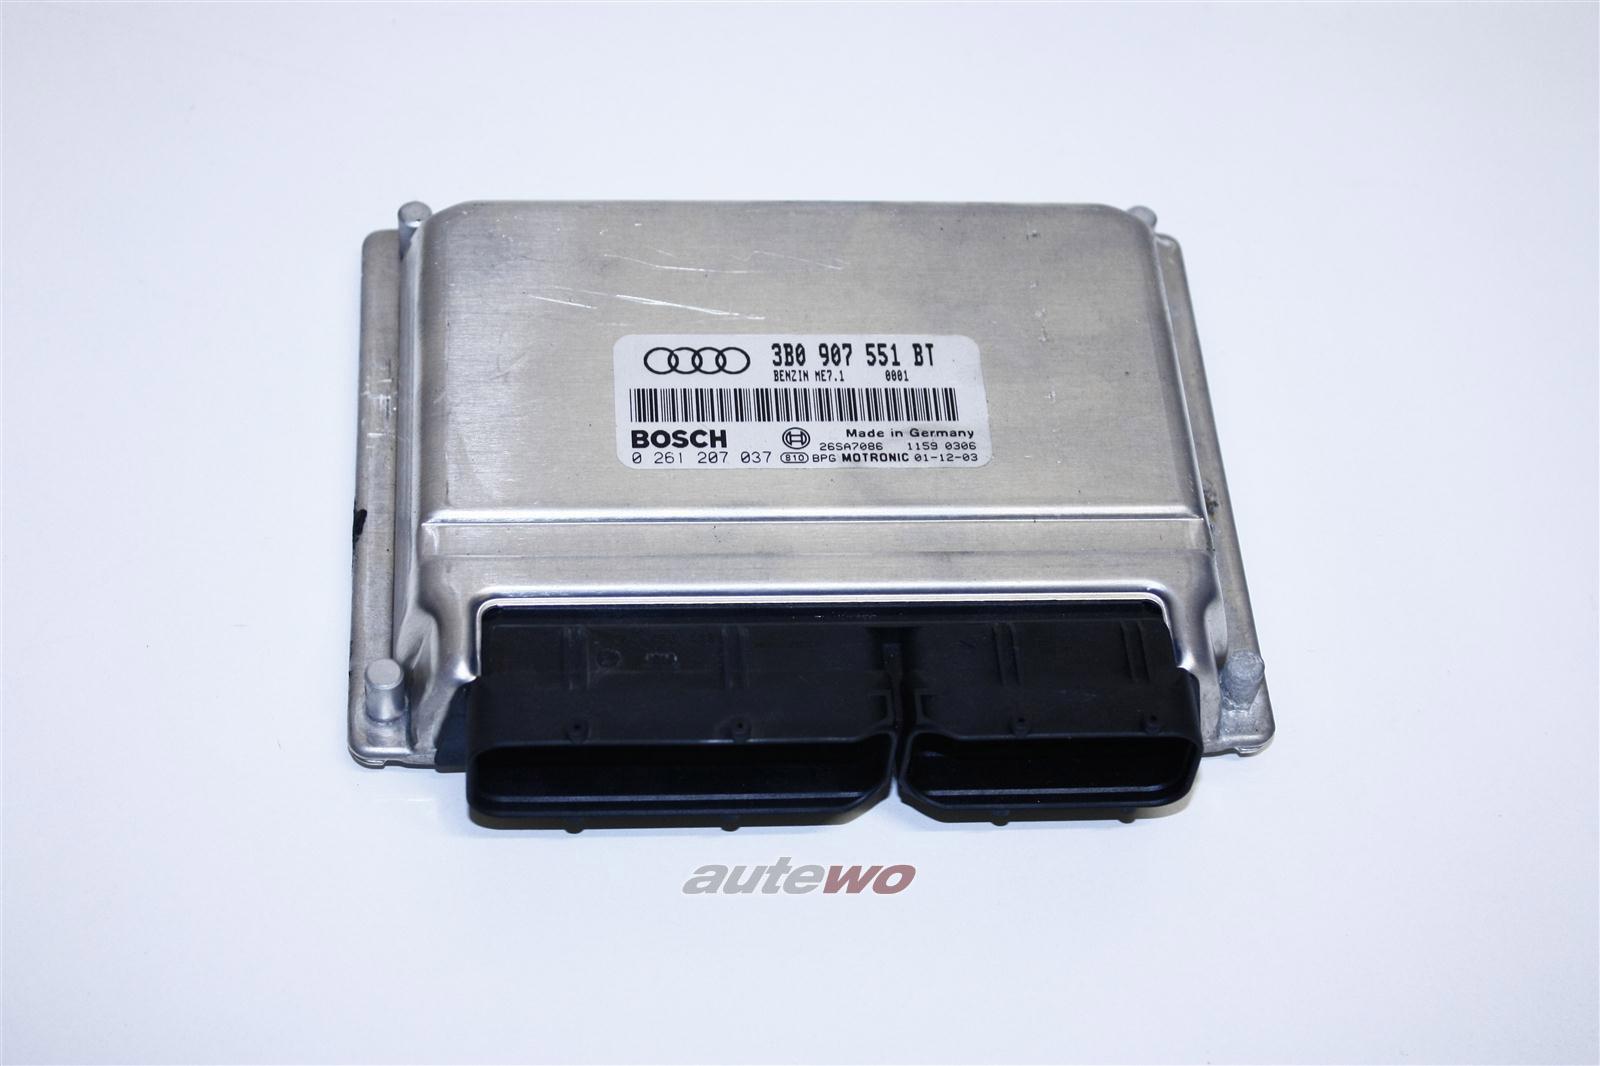 Audi A8 D2 2.8l 193PS AMX Motorsteuergerät 3B0997551CX 3B0907551BT